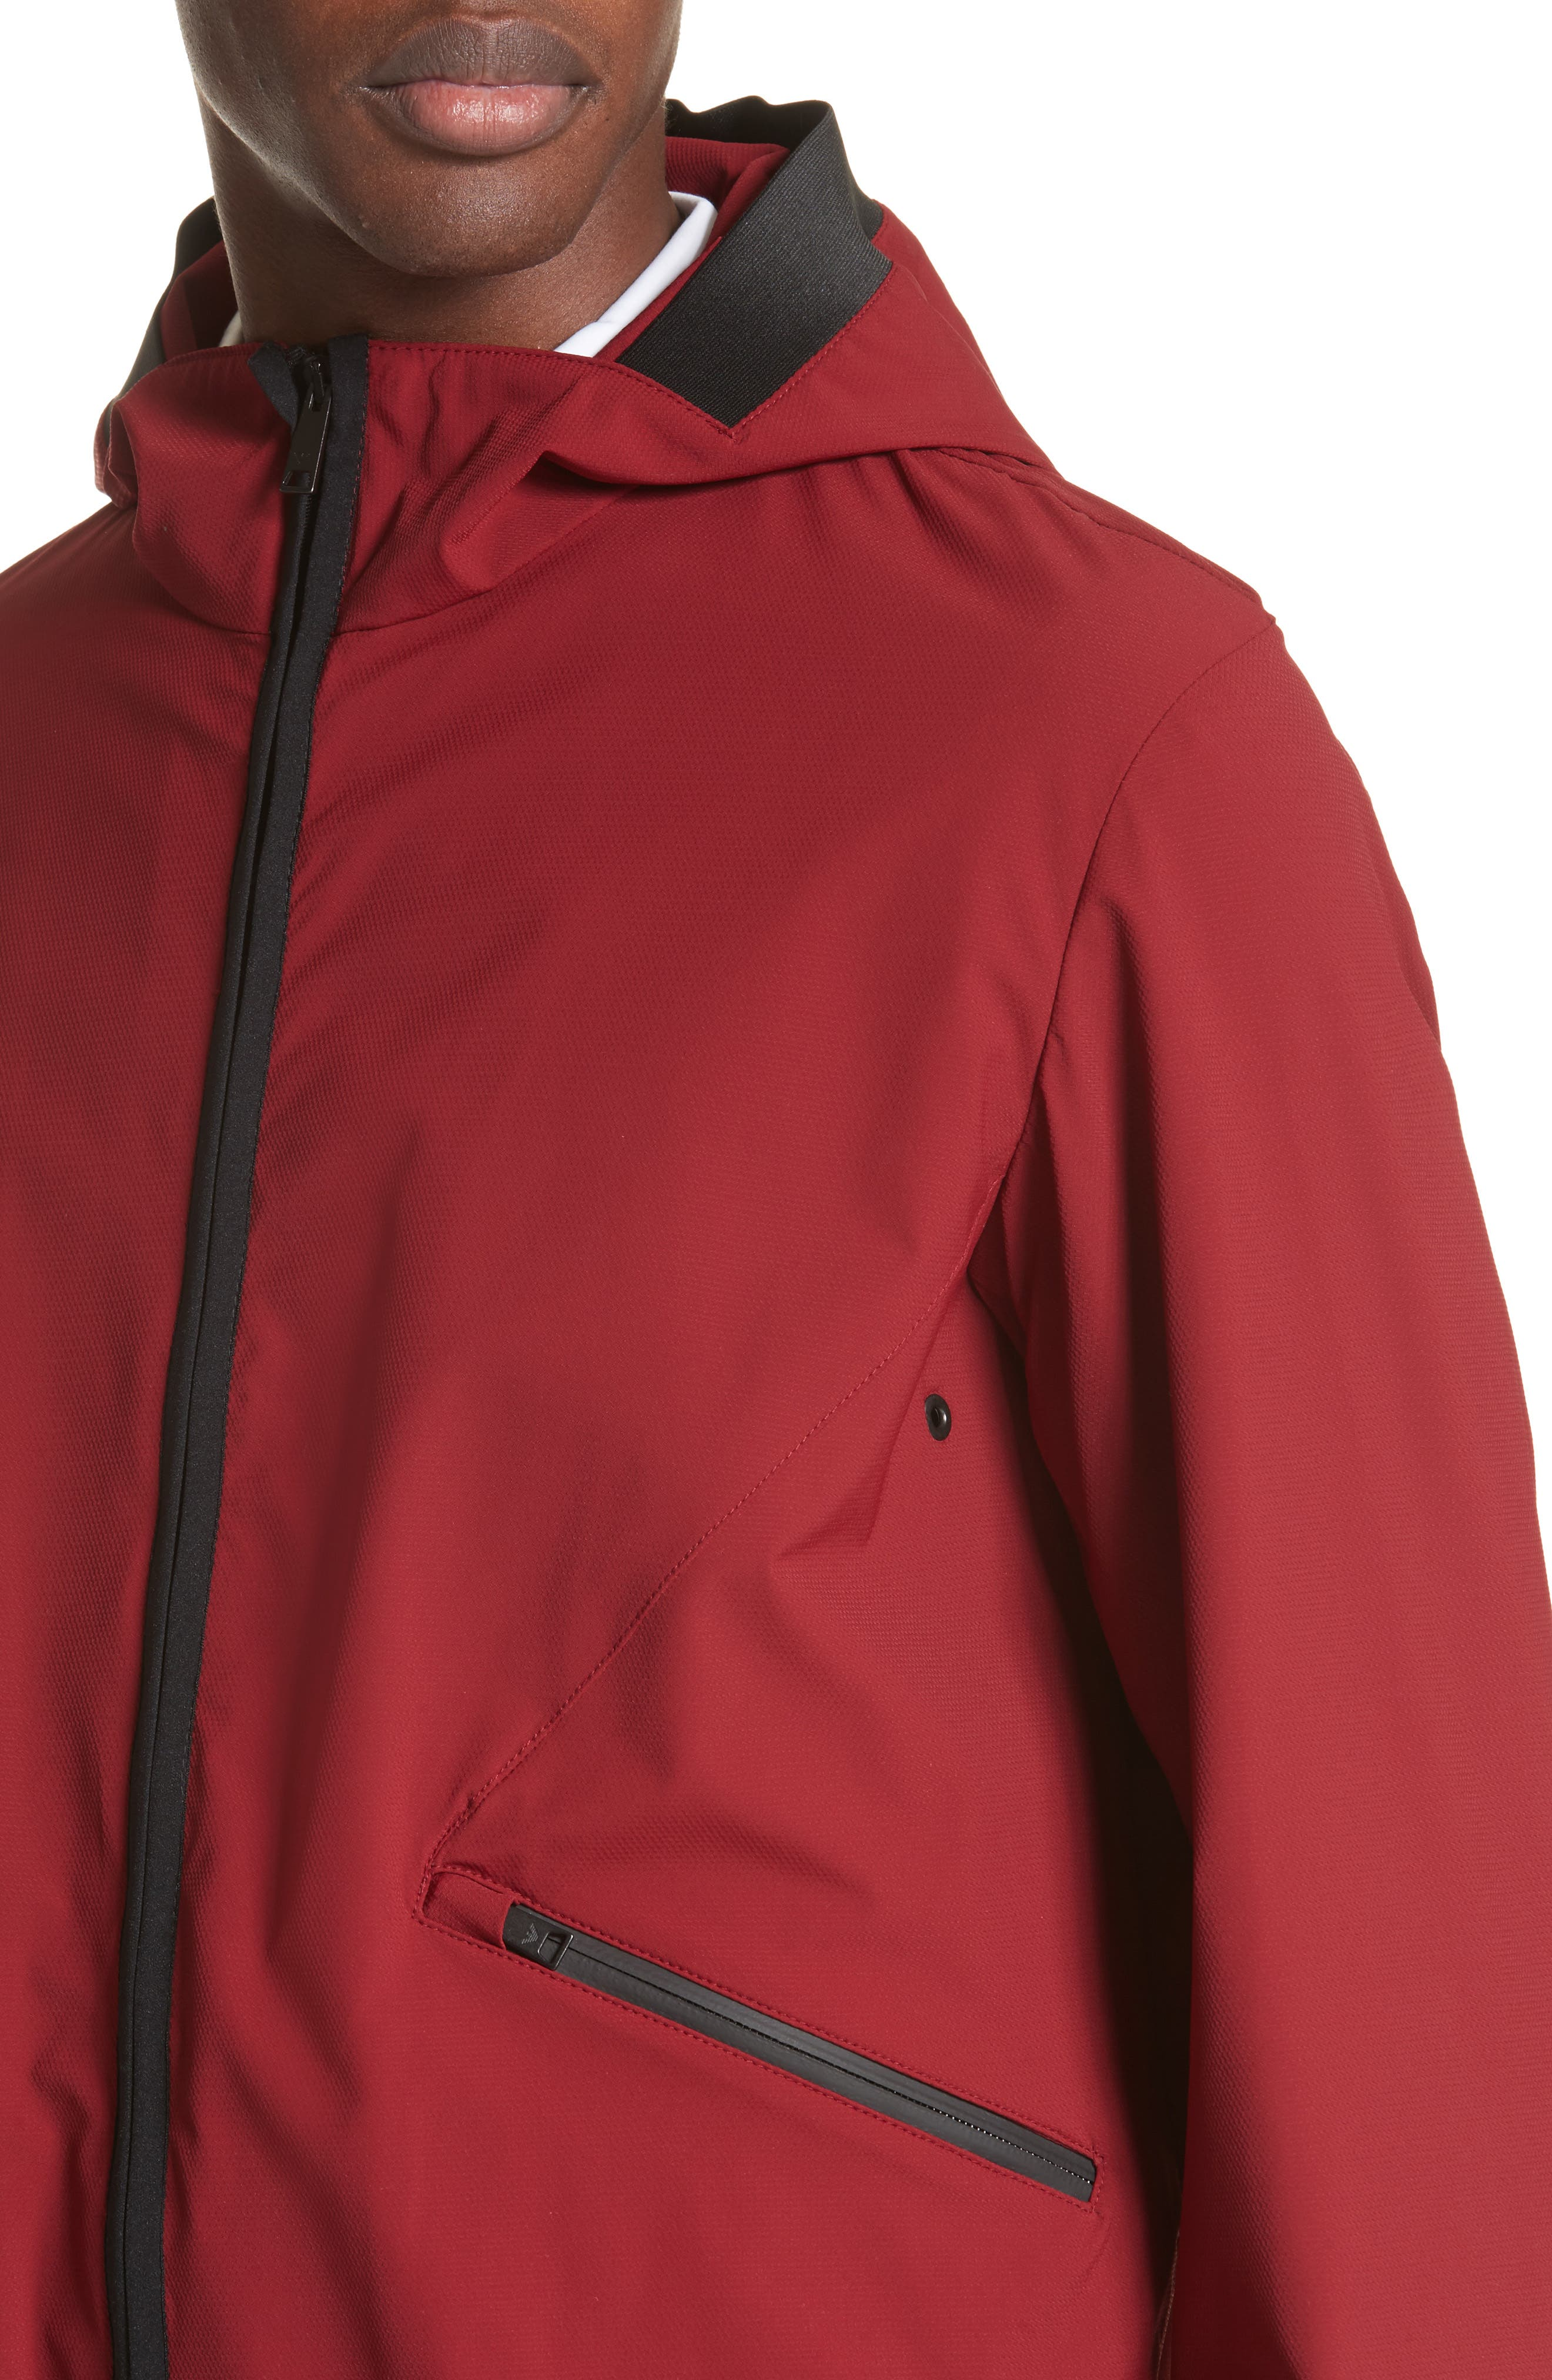 Water Repellent Jacket,                             Alternate thumbnail 4, color,                             624